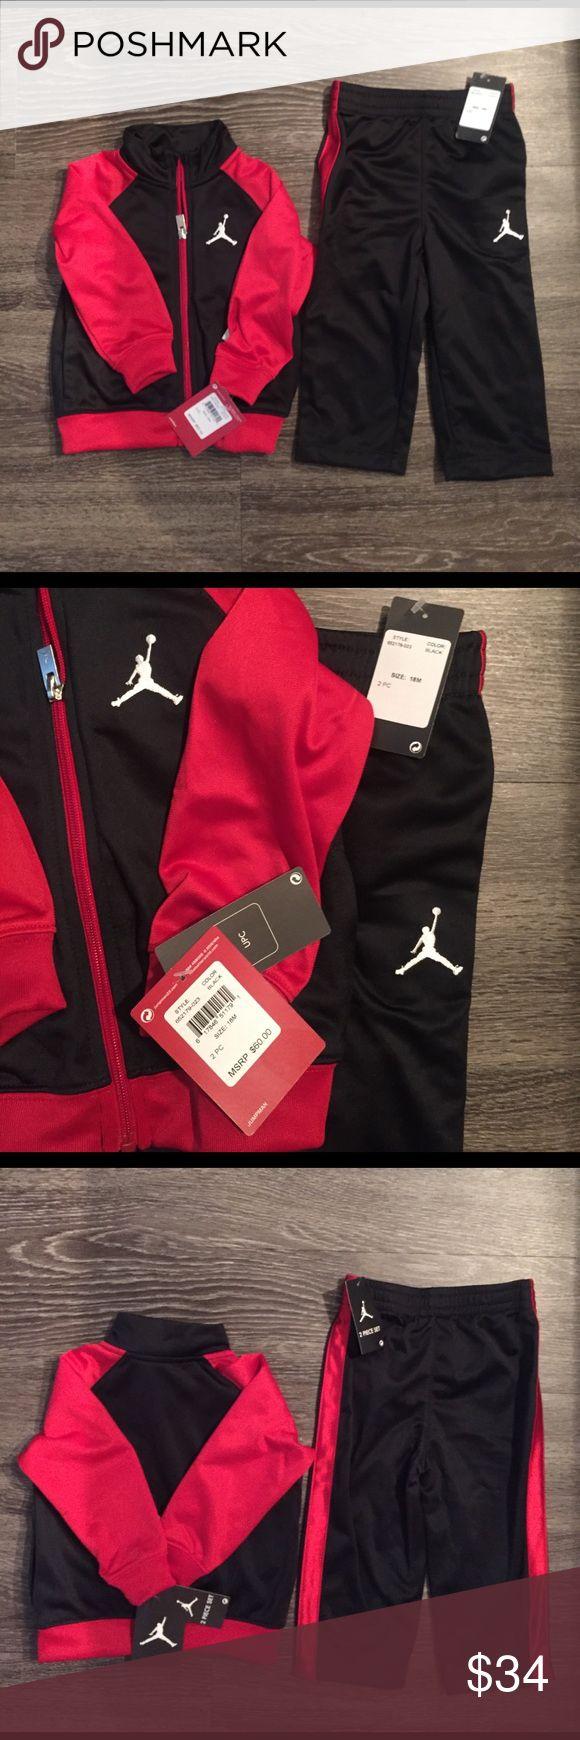 25 Best Ideas About Matching Jordans On Pinterest Baby